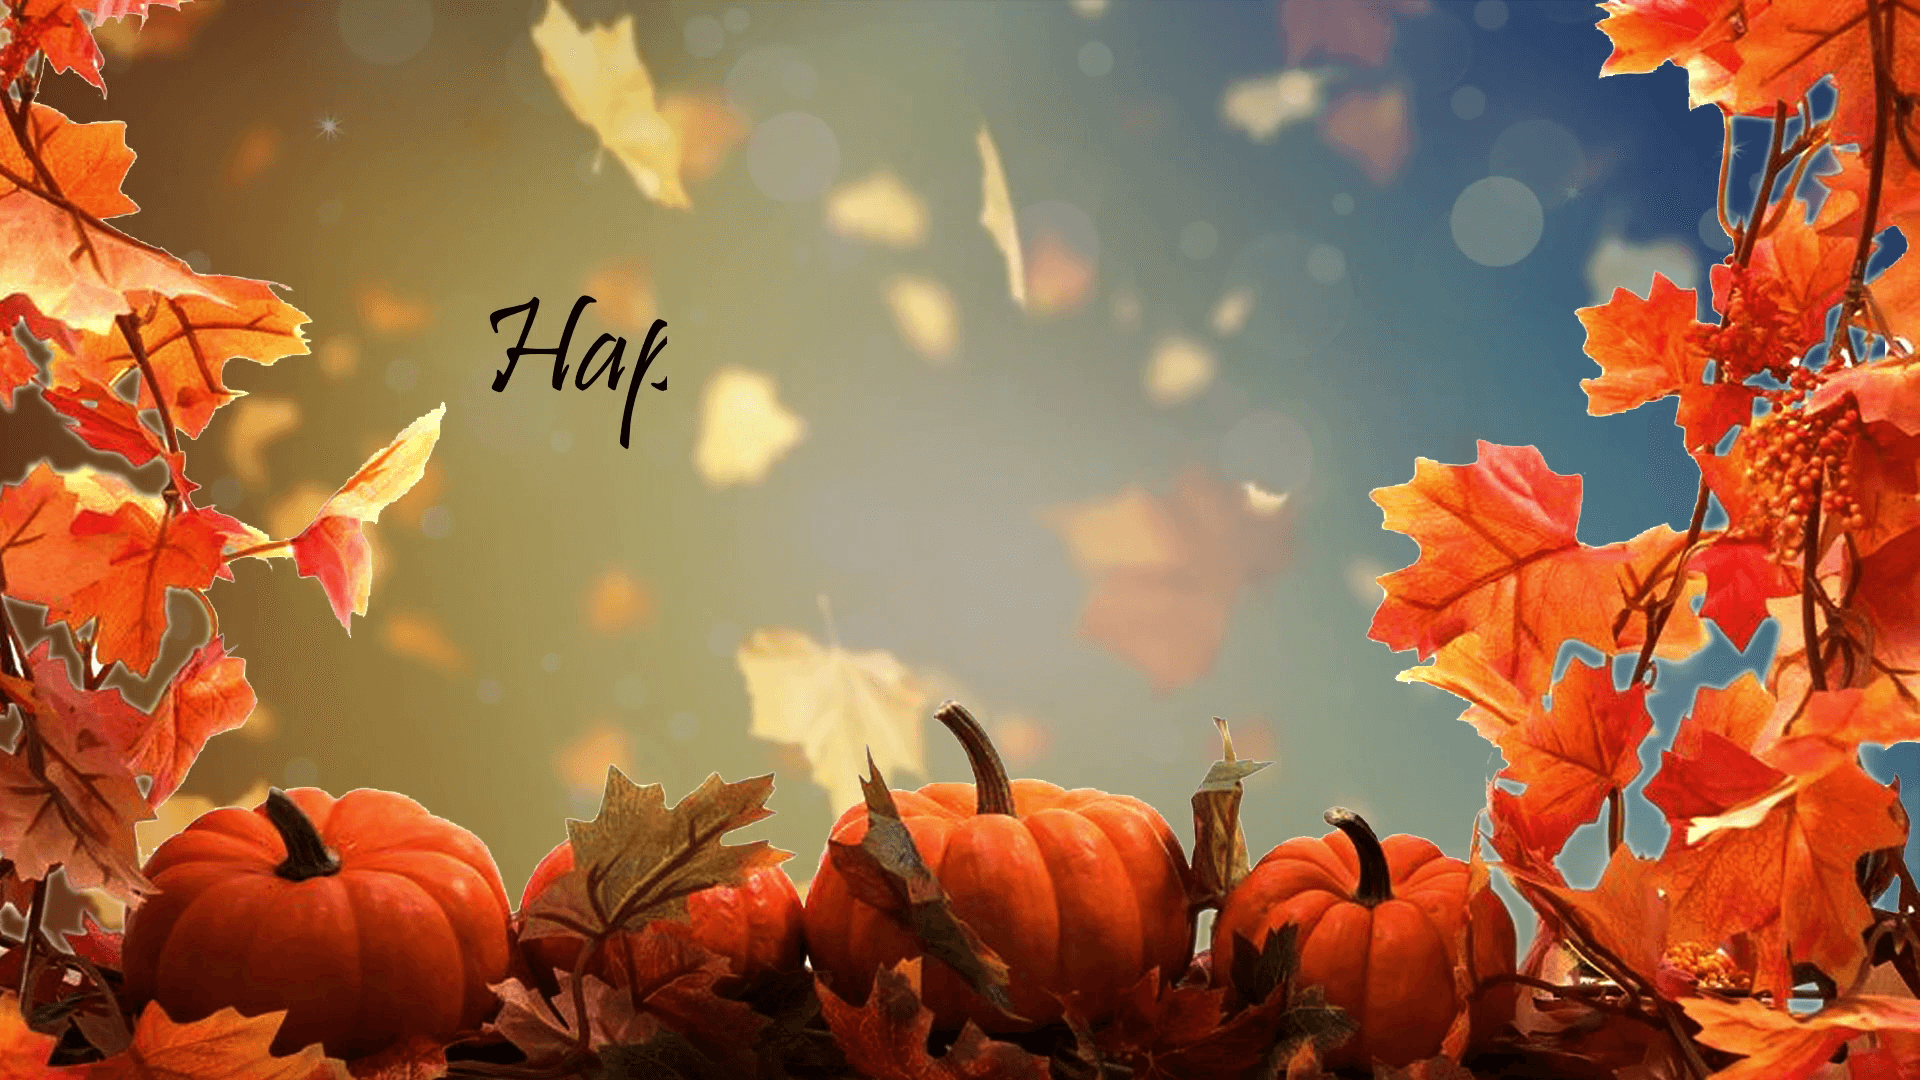 Thanksgiving Background Pics